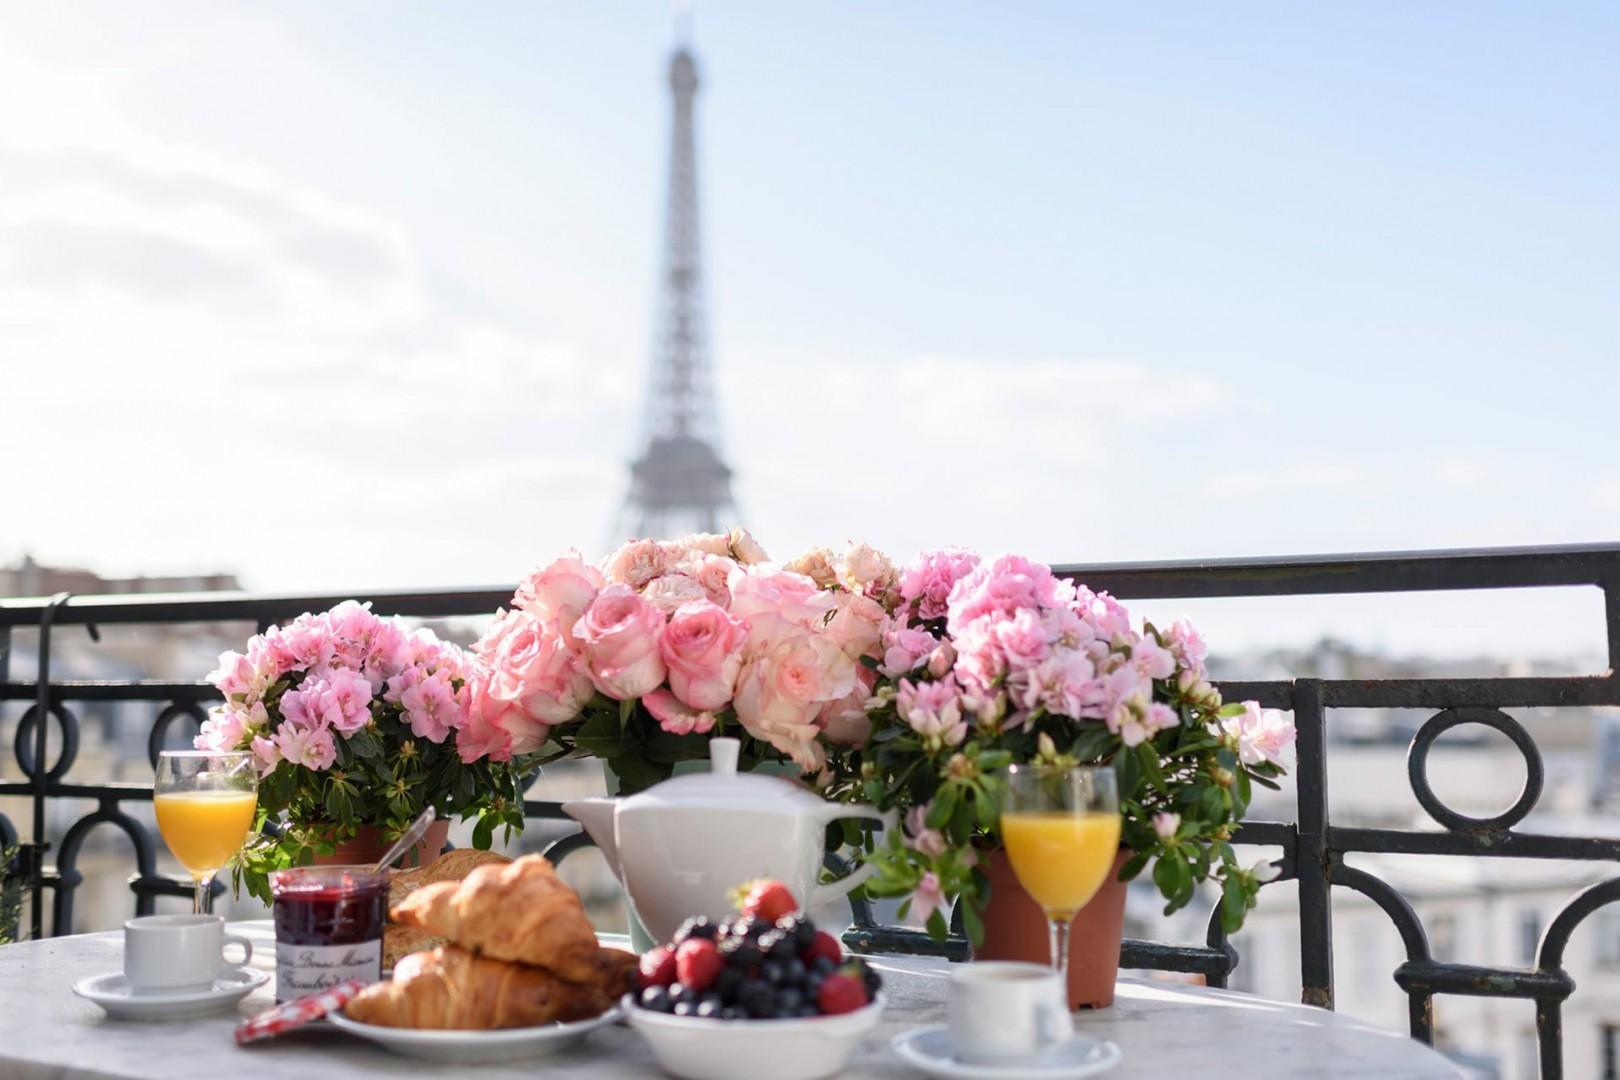 Treat yourself to al fresco breakfasts with breathtaking views!